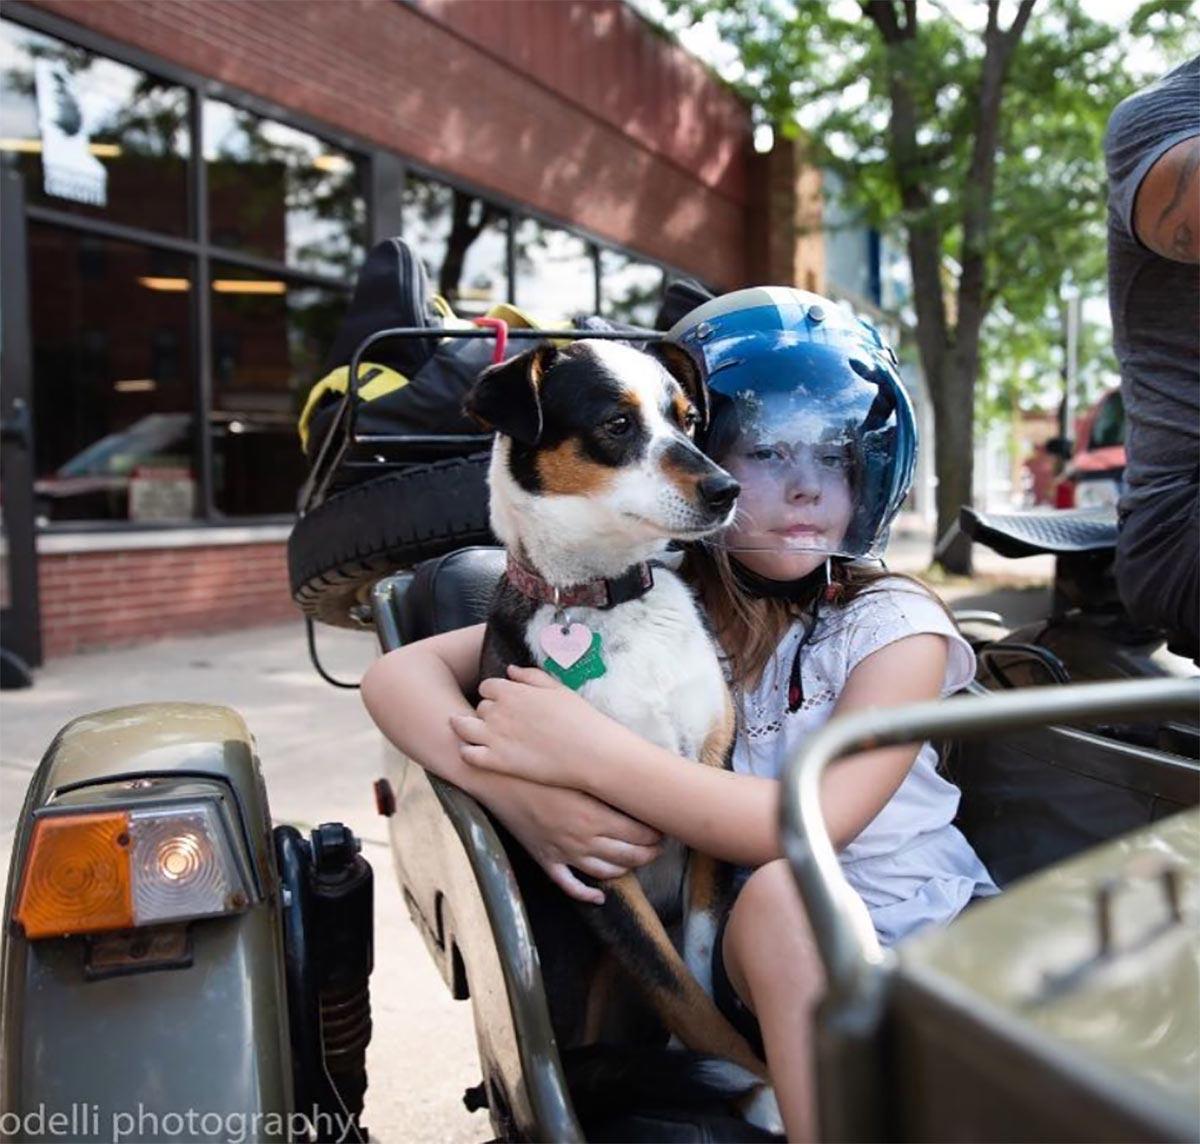 Kids Love Sidecars